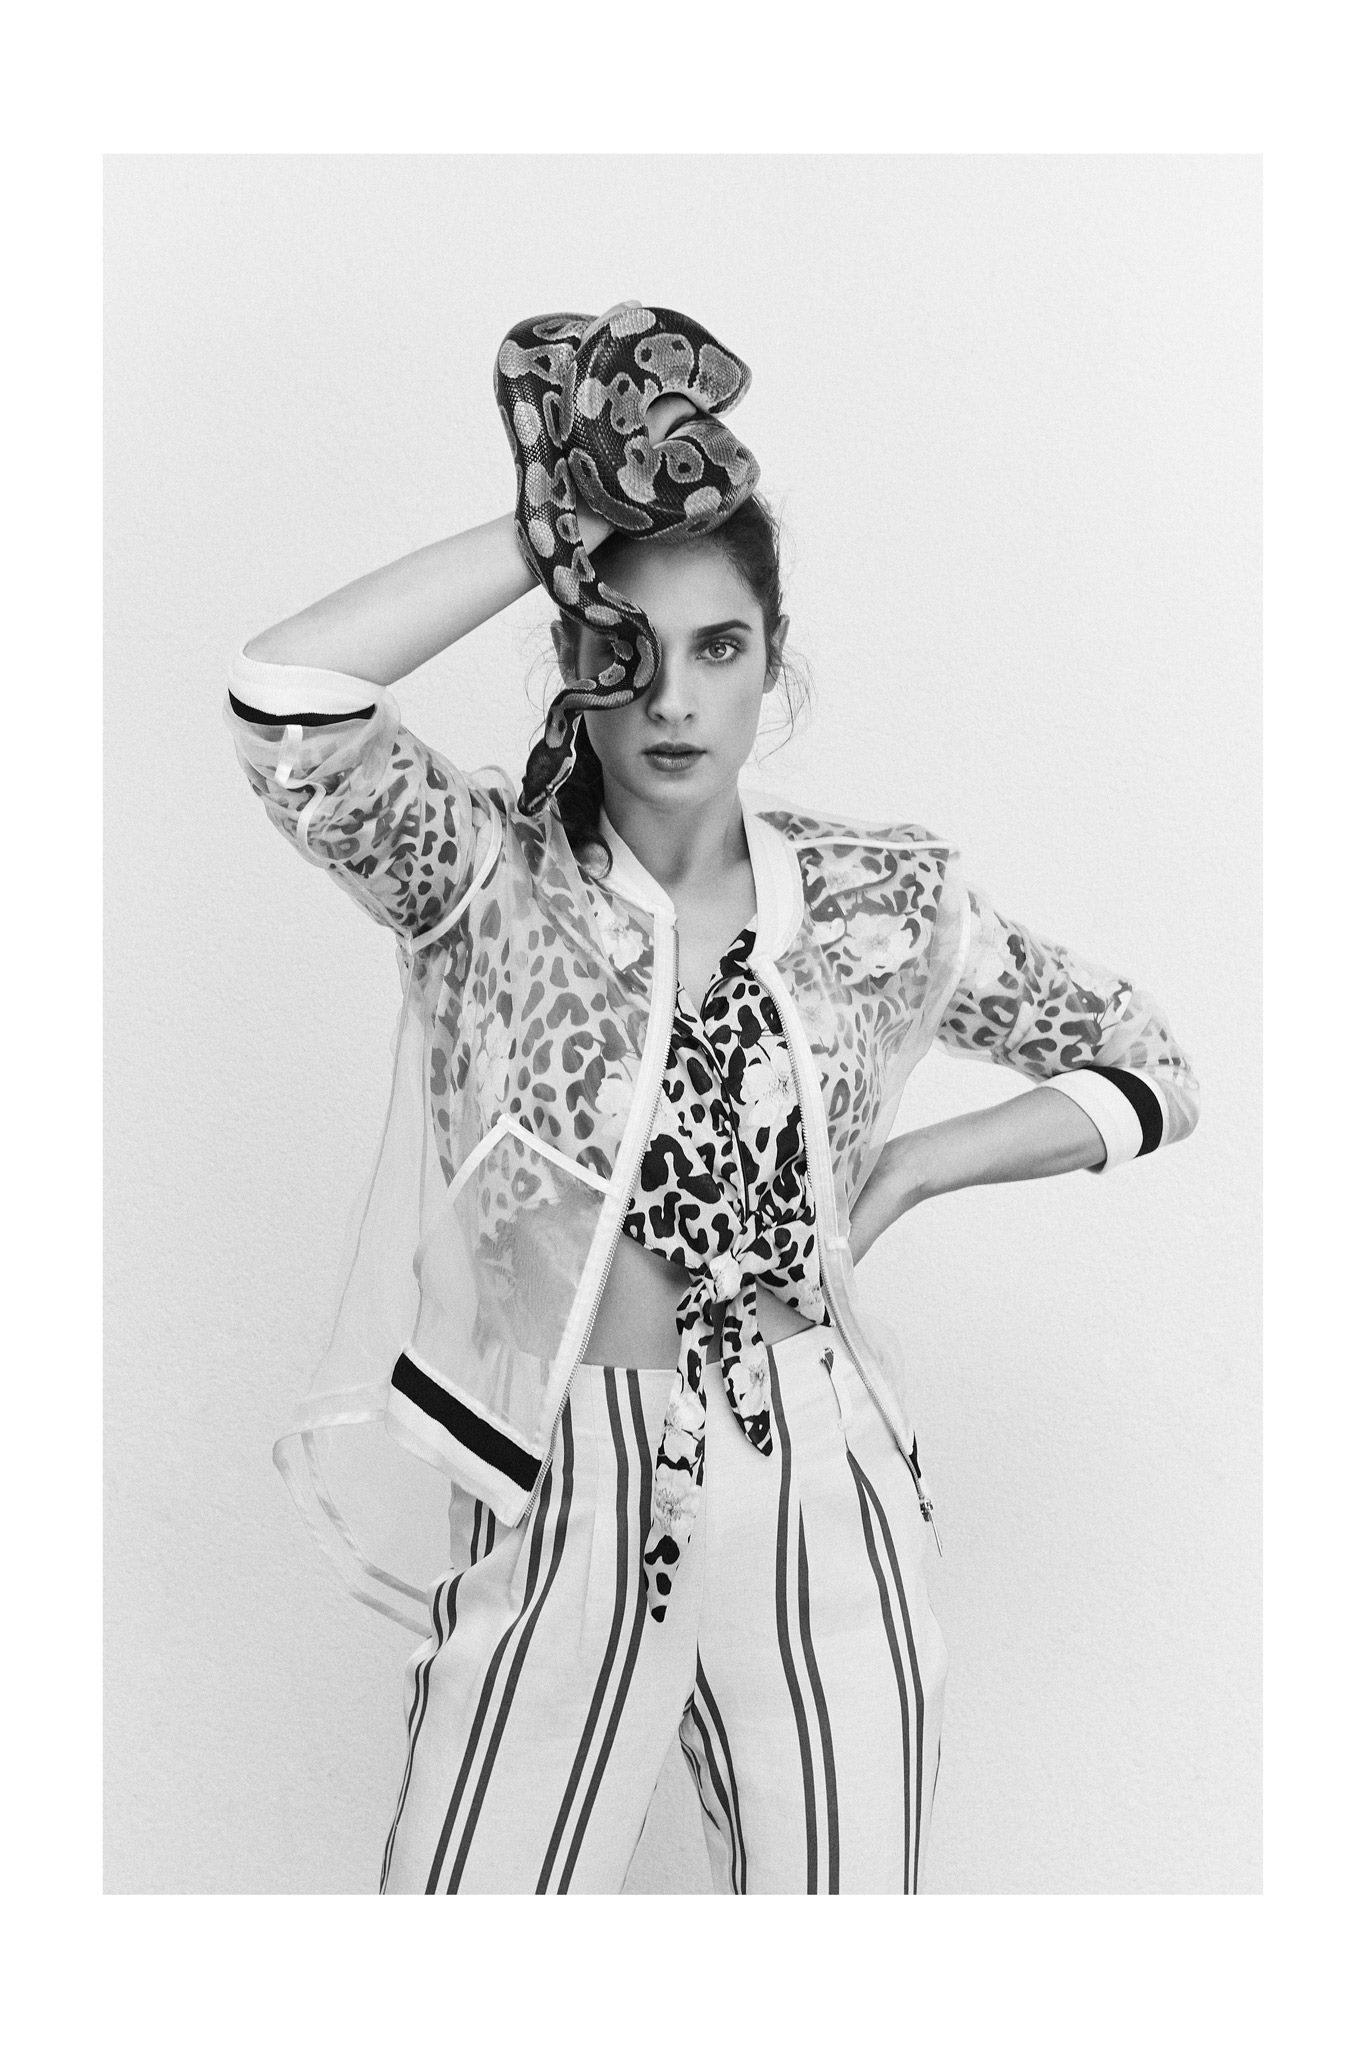 An unpublished B&W shot of amazing actress Saša Pavlin S for Story Magazine